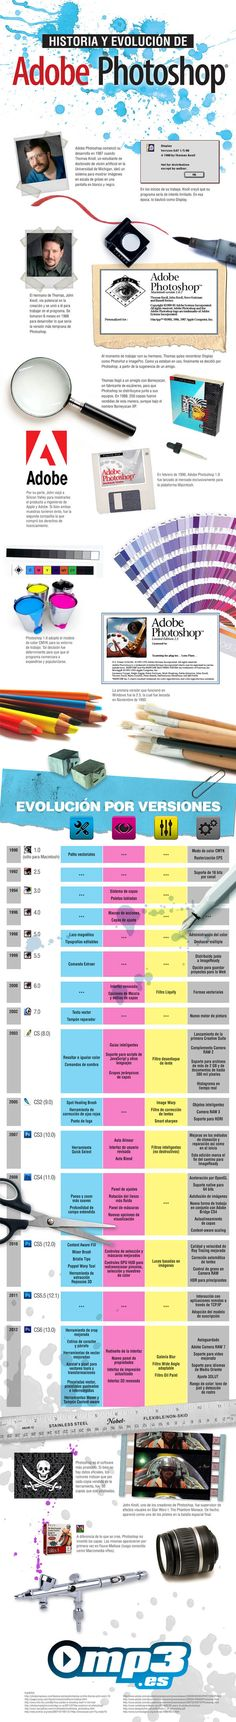 Historia Adobe Photoshop